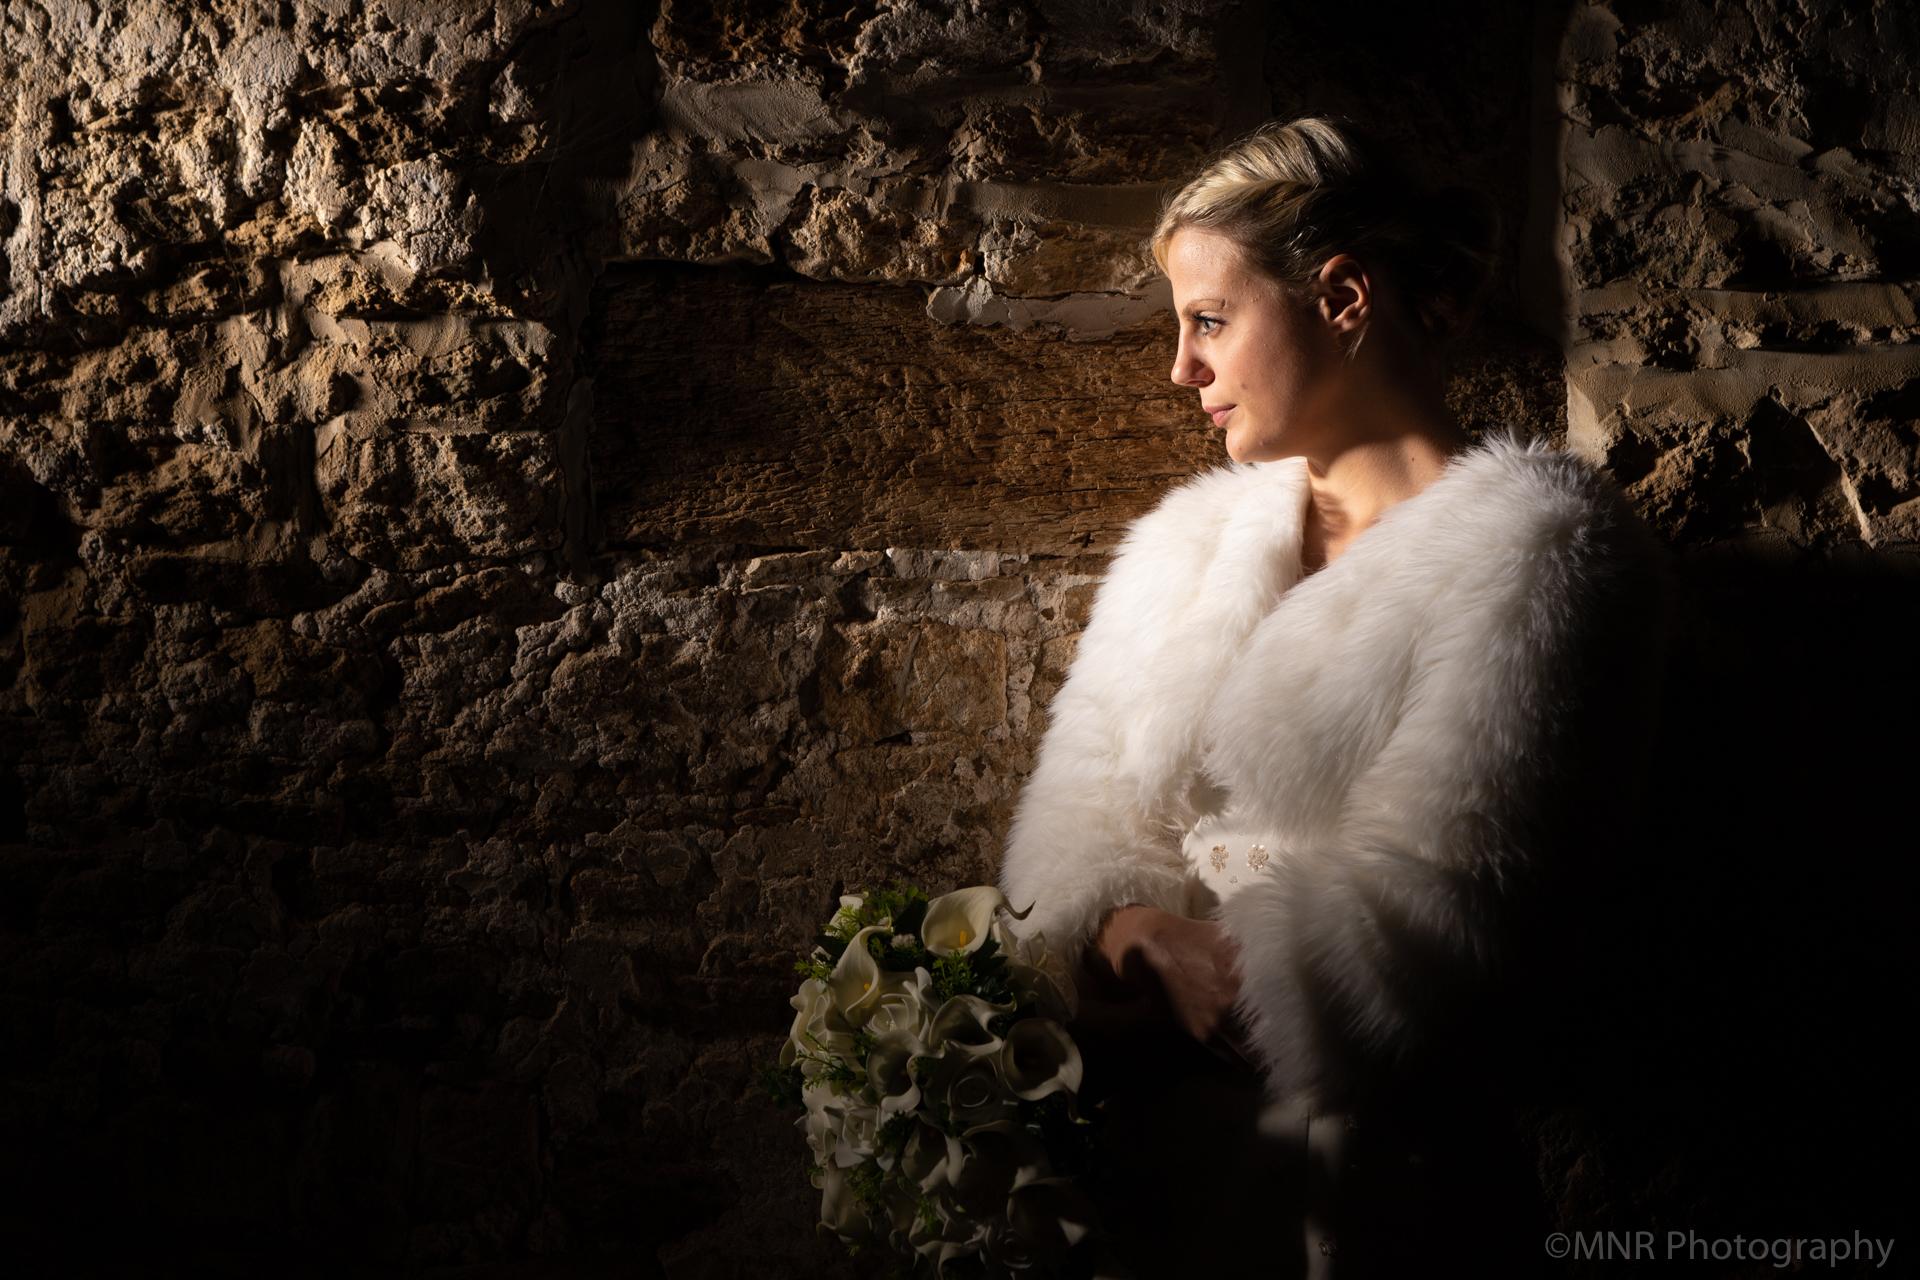 Bride in the dark